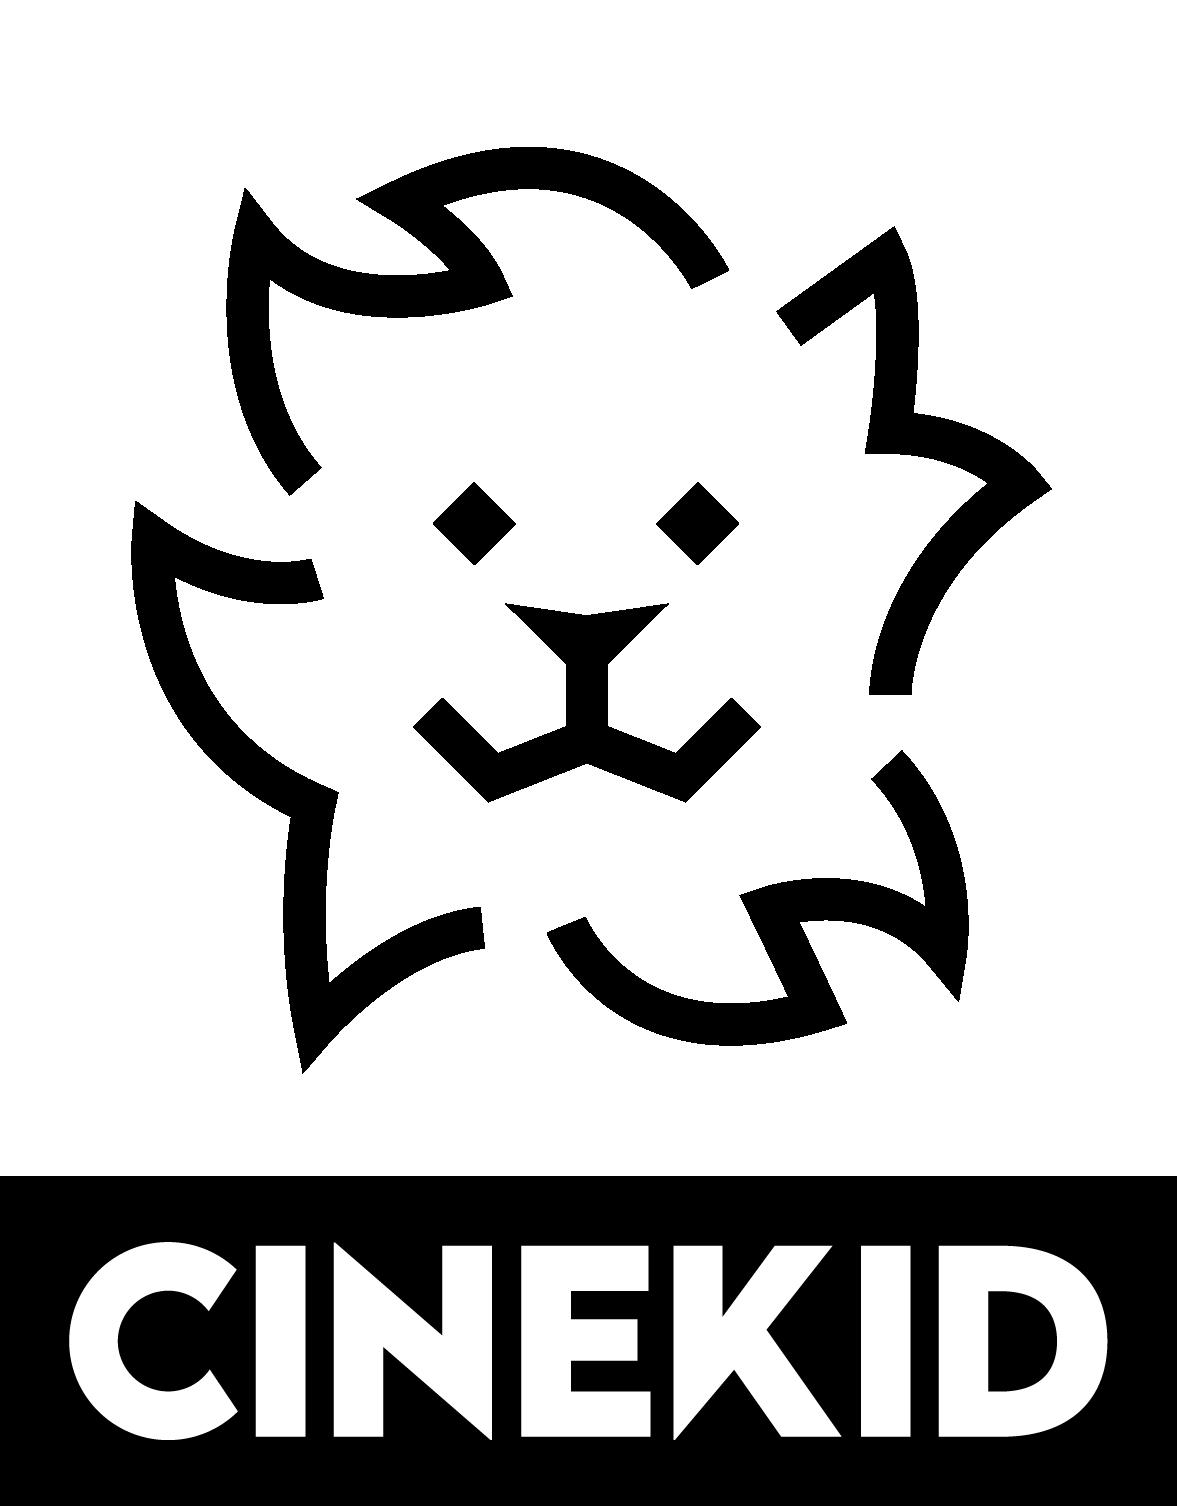 cinekid logo